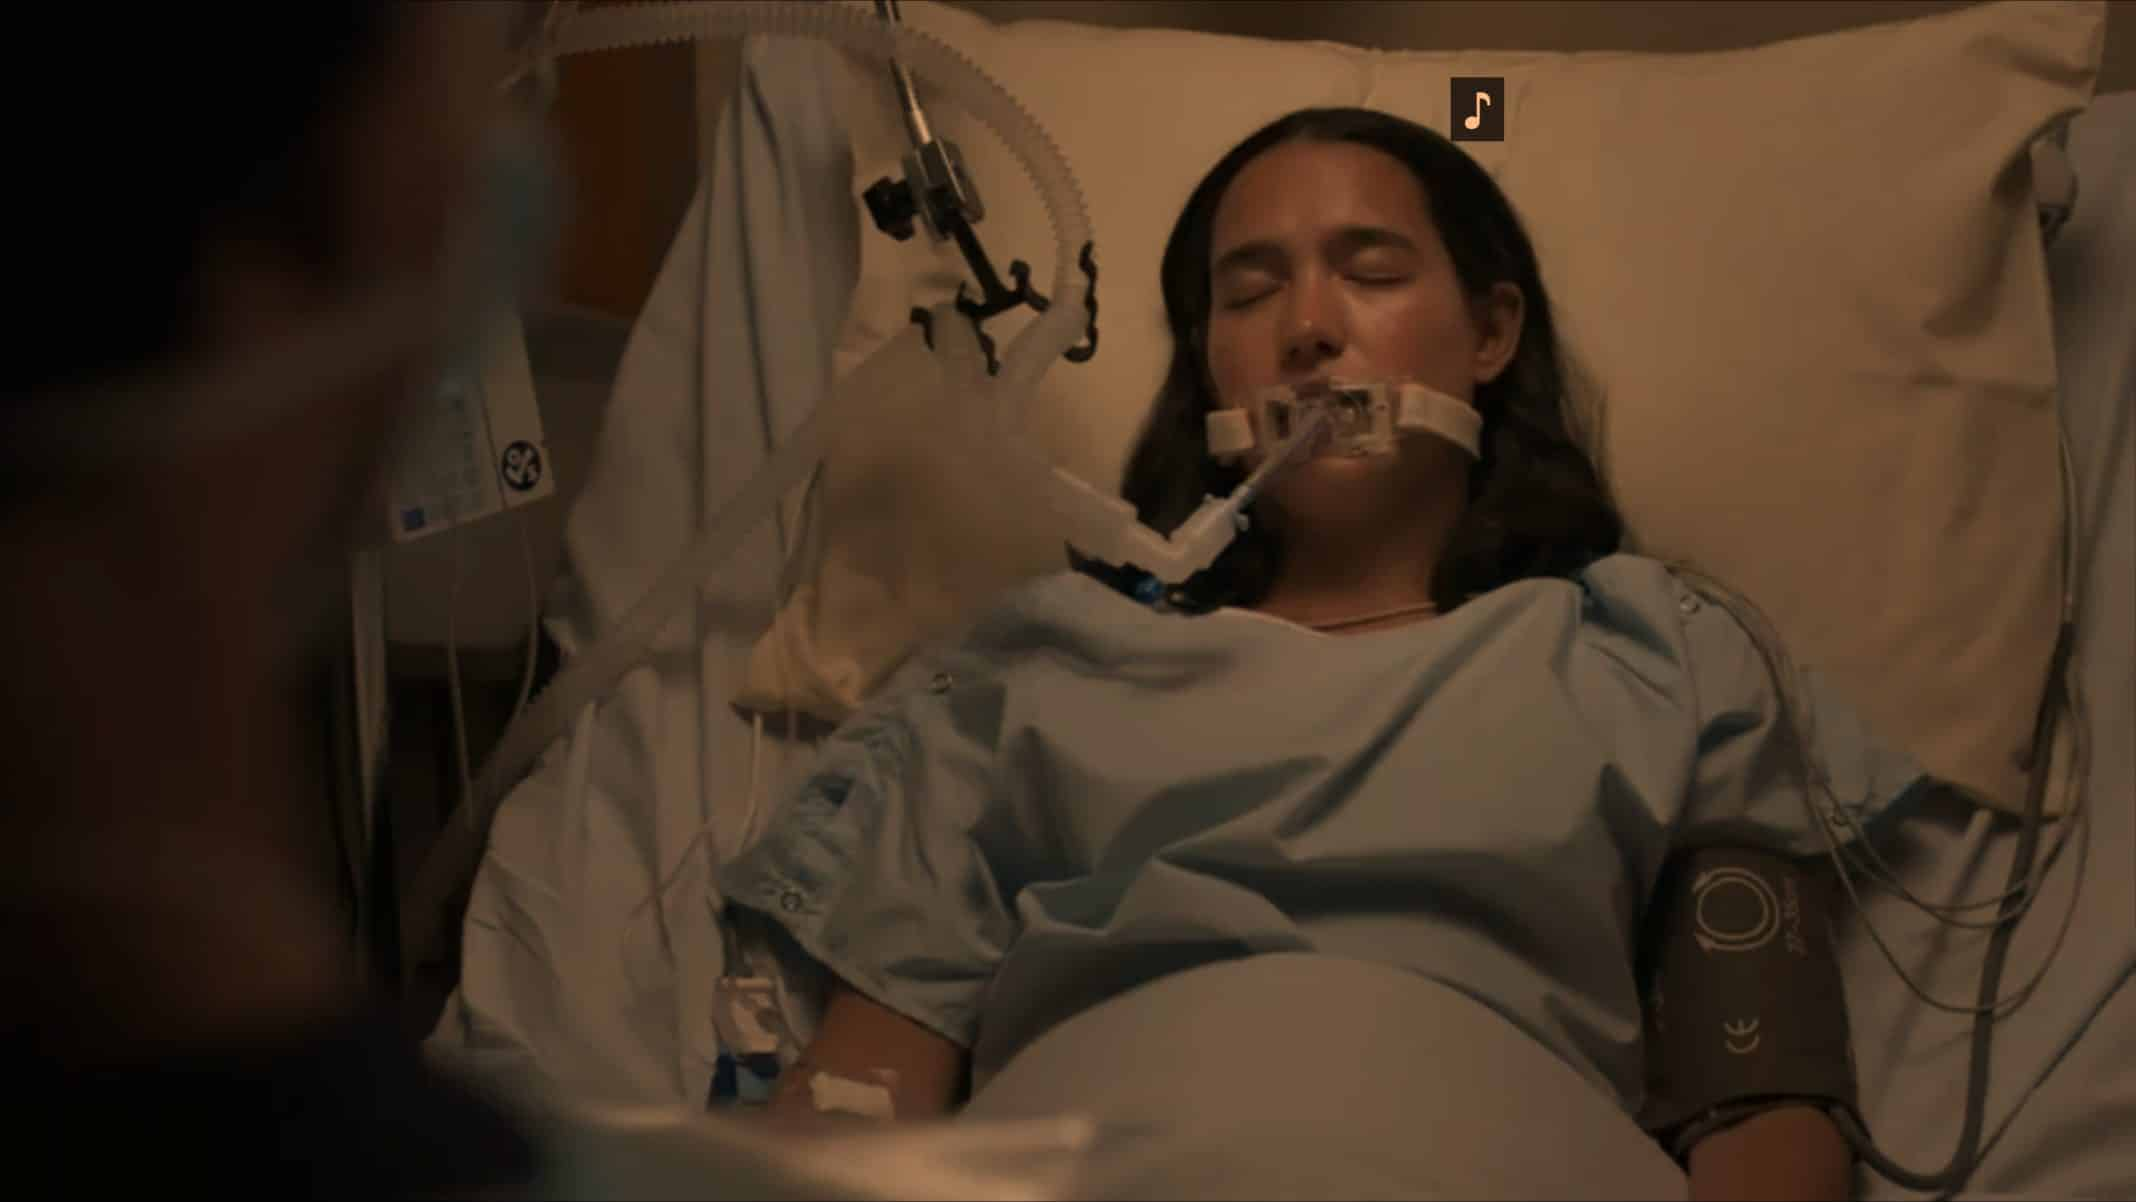 Ambar (Arlen Aguayo-Stewart) in critical condition